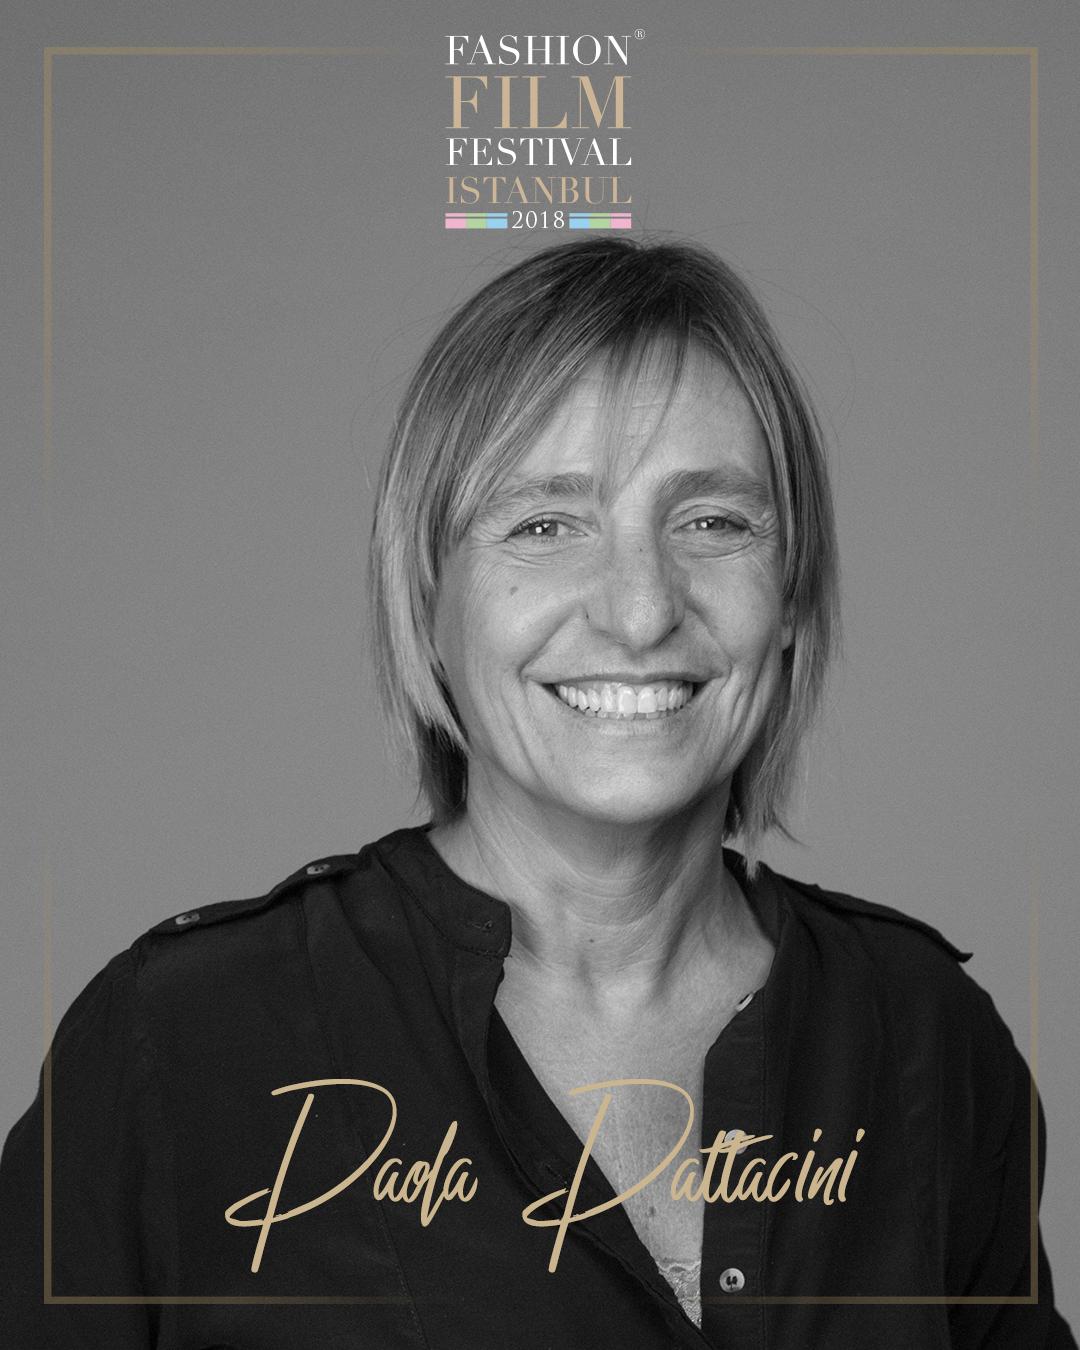 Paola Pattacini    Rome Fashion School Coordinator    IED Istituto Europeo di Design